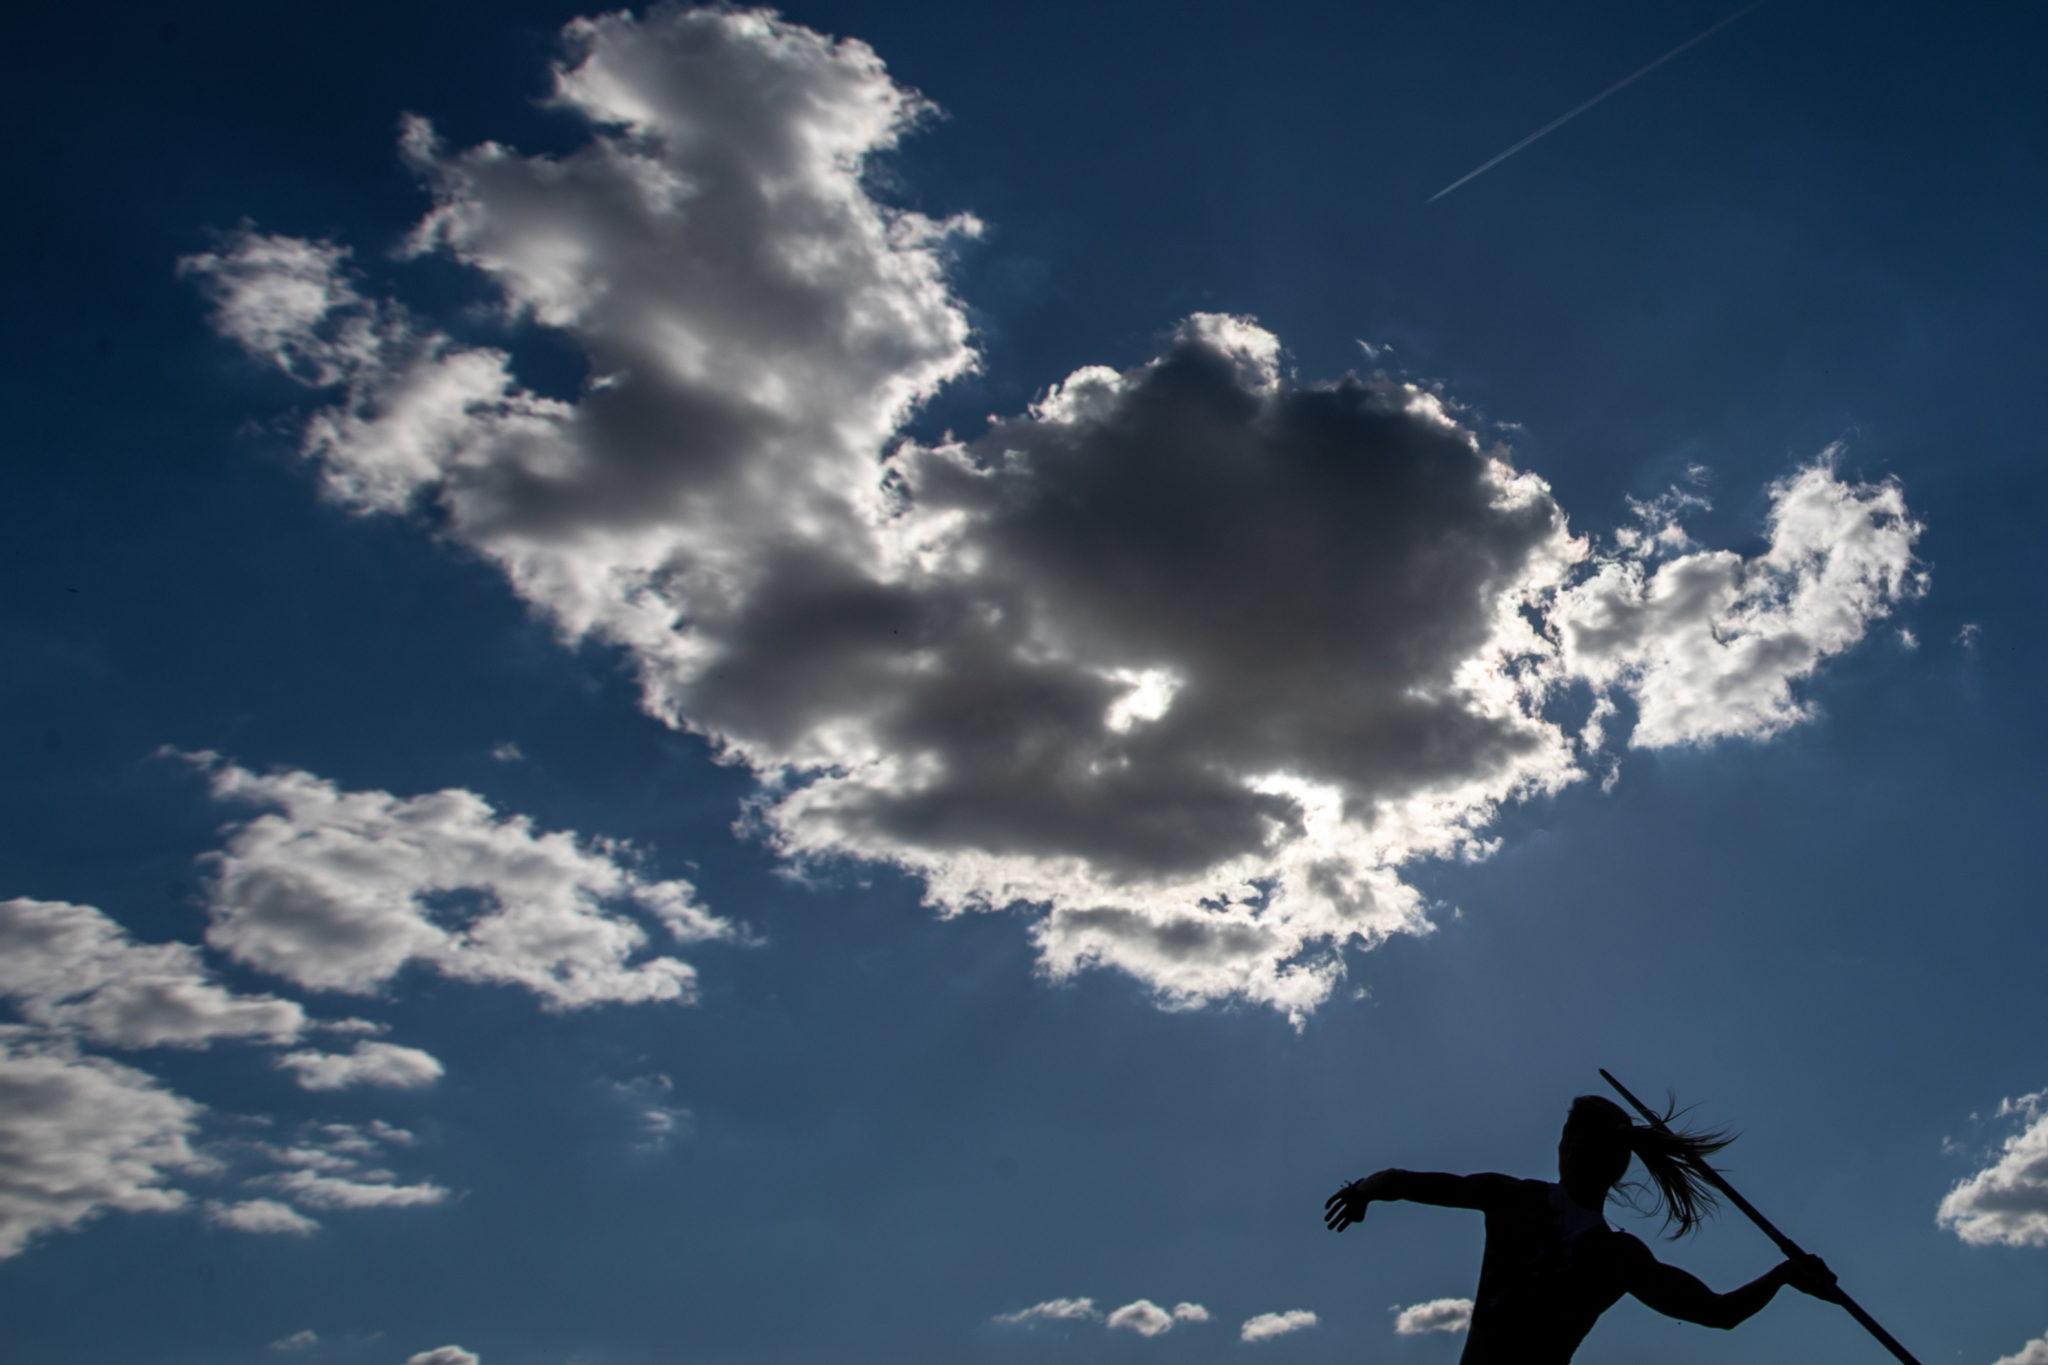 Pierwsze, lekkoatletyczne zawody w Czechach., Fot. EPA/MARTIN DIVISEK